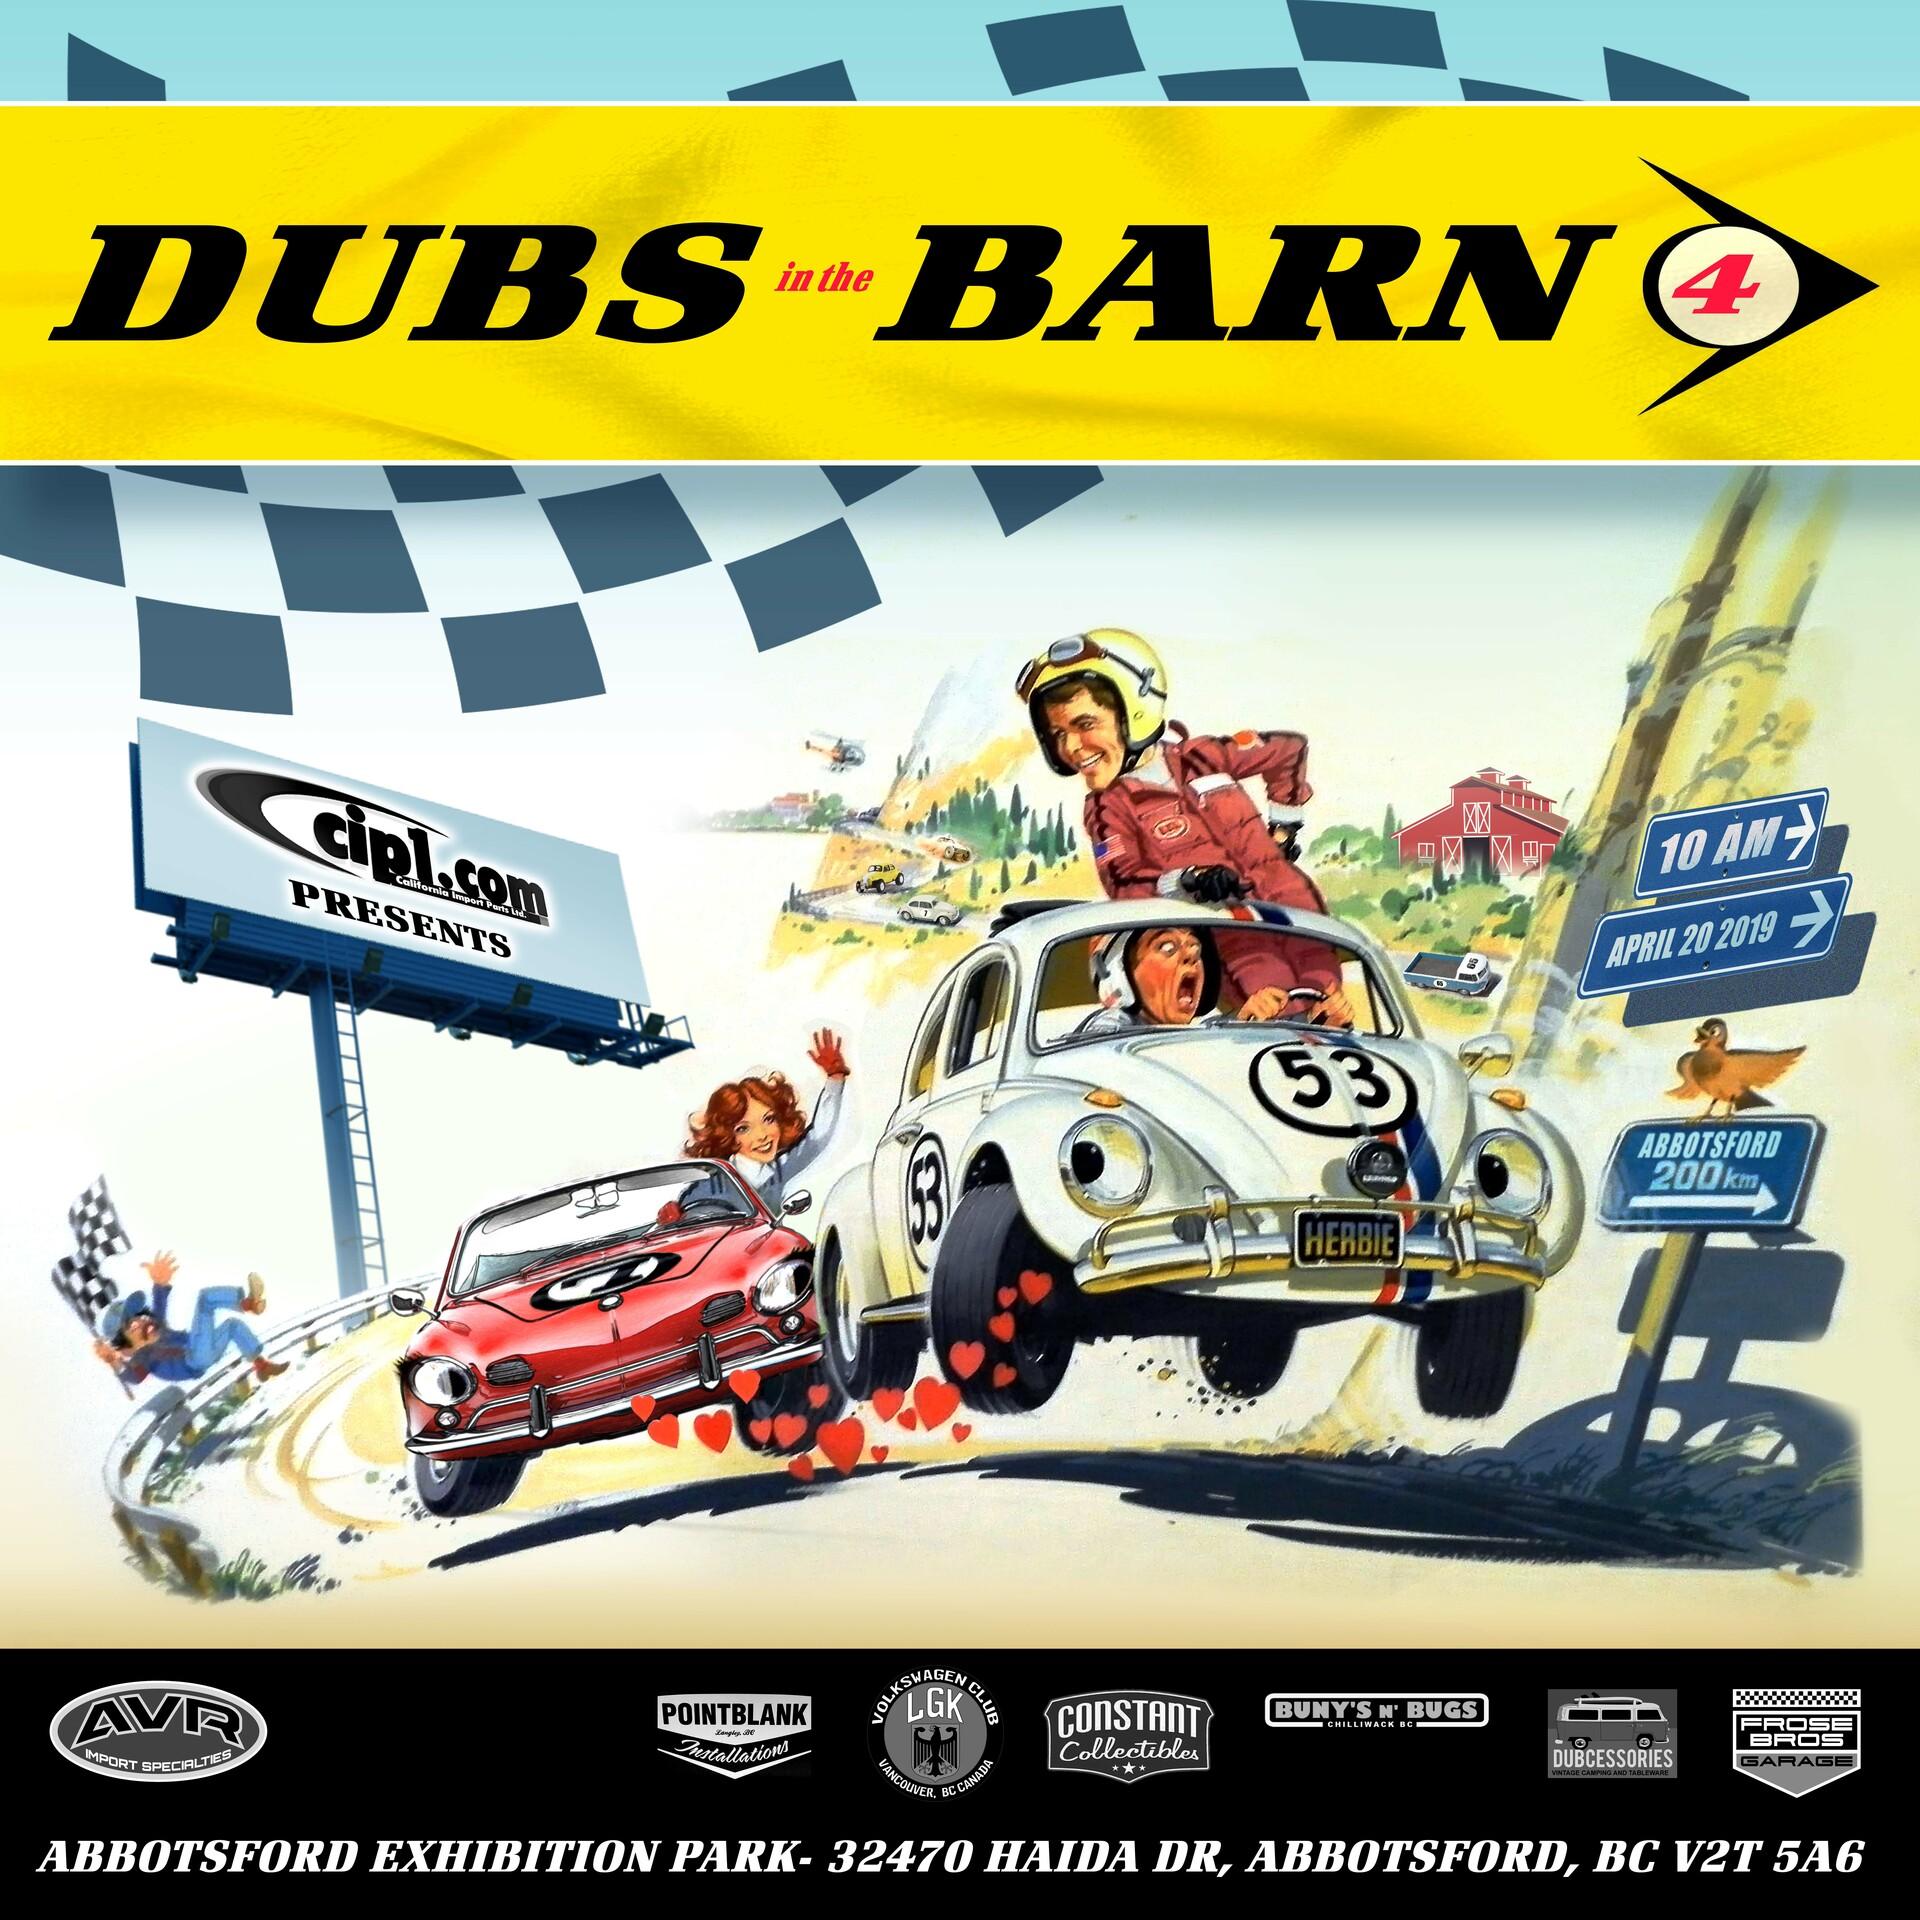 VW Poster